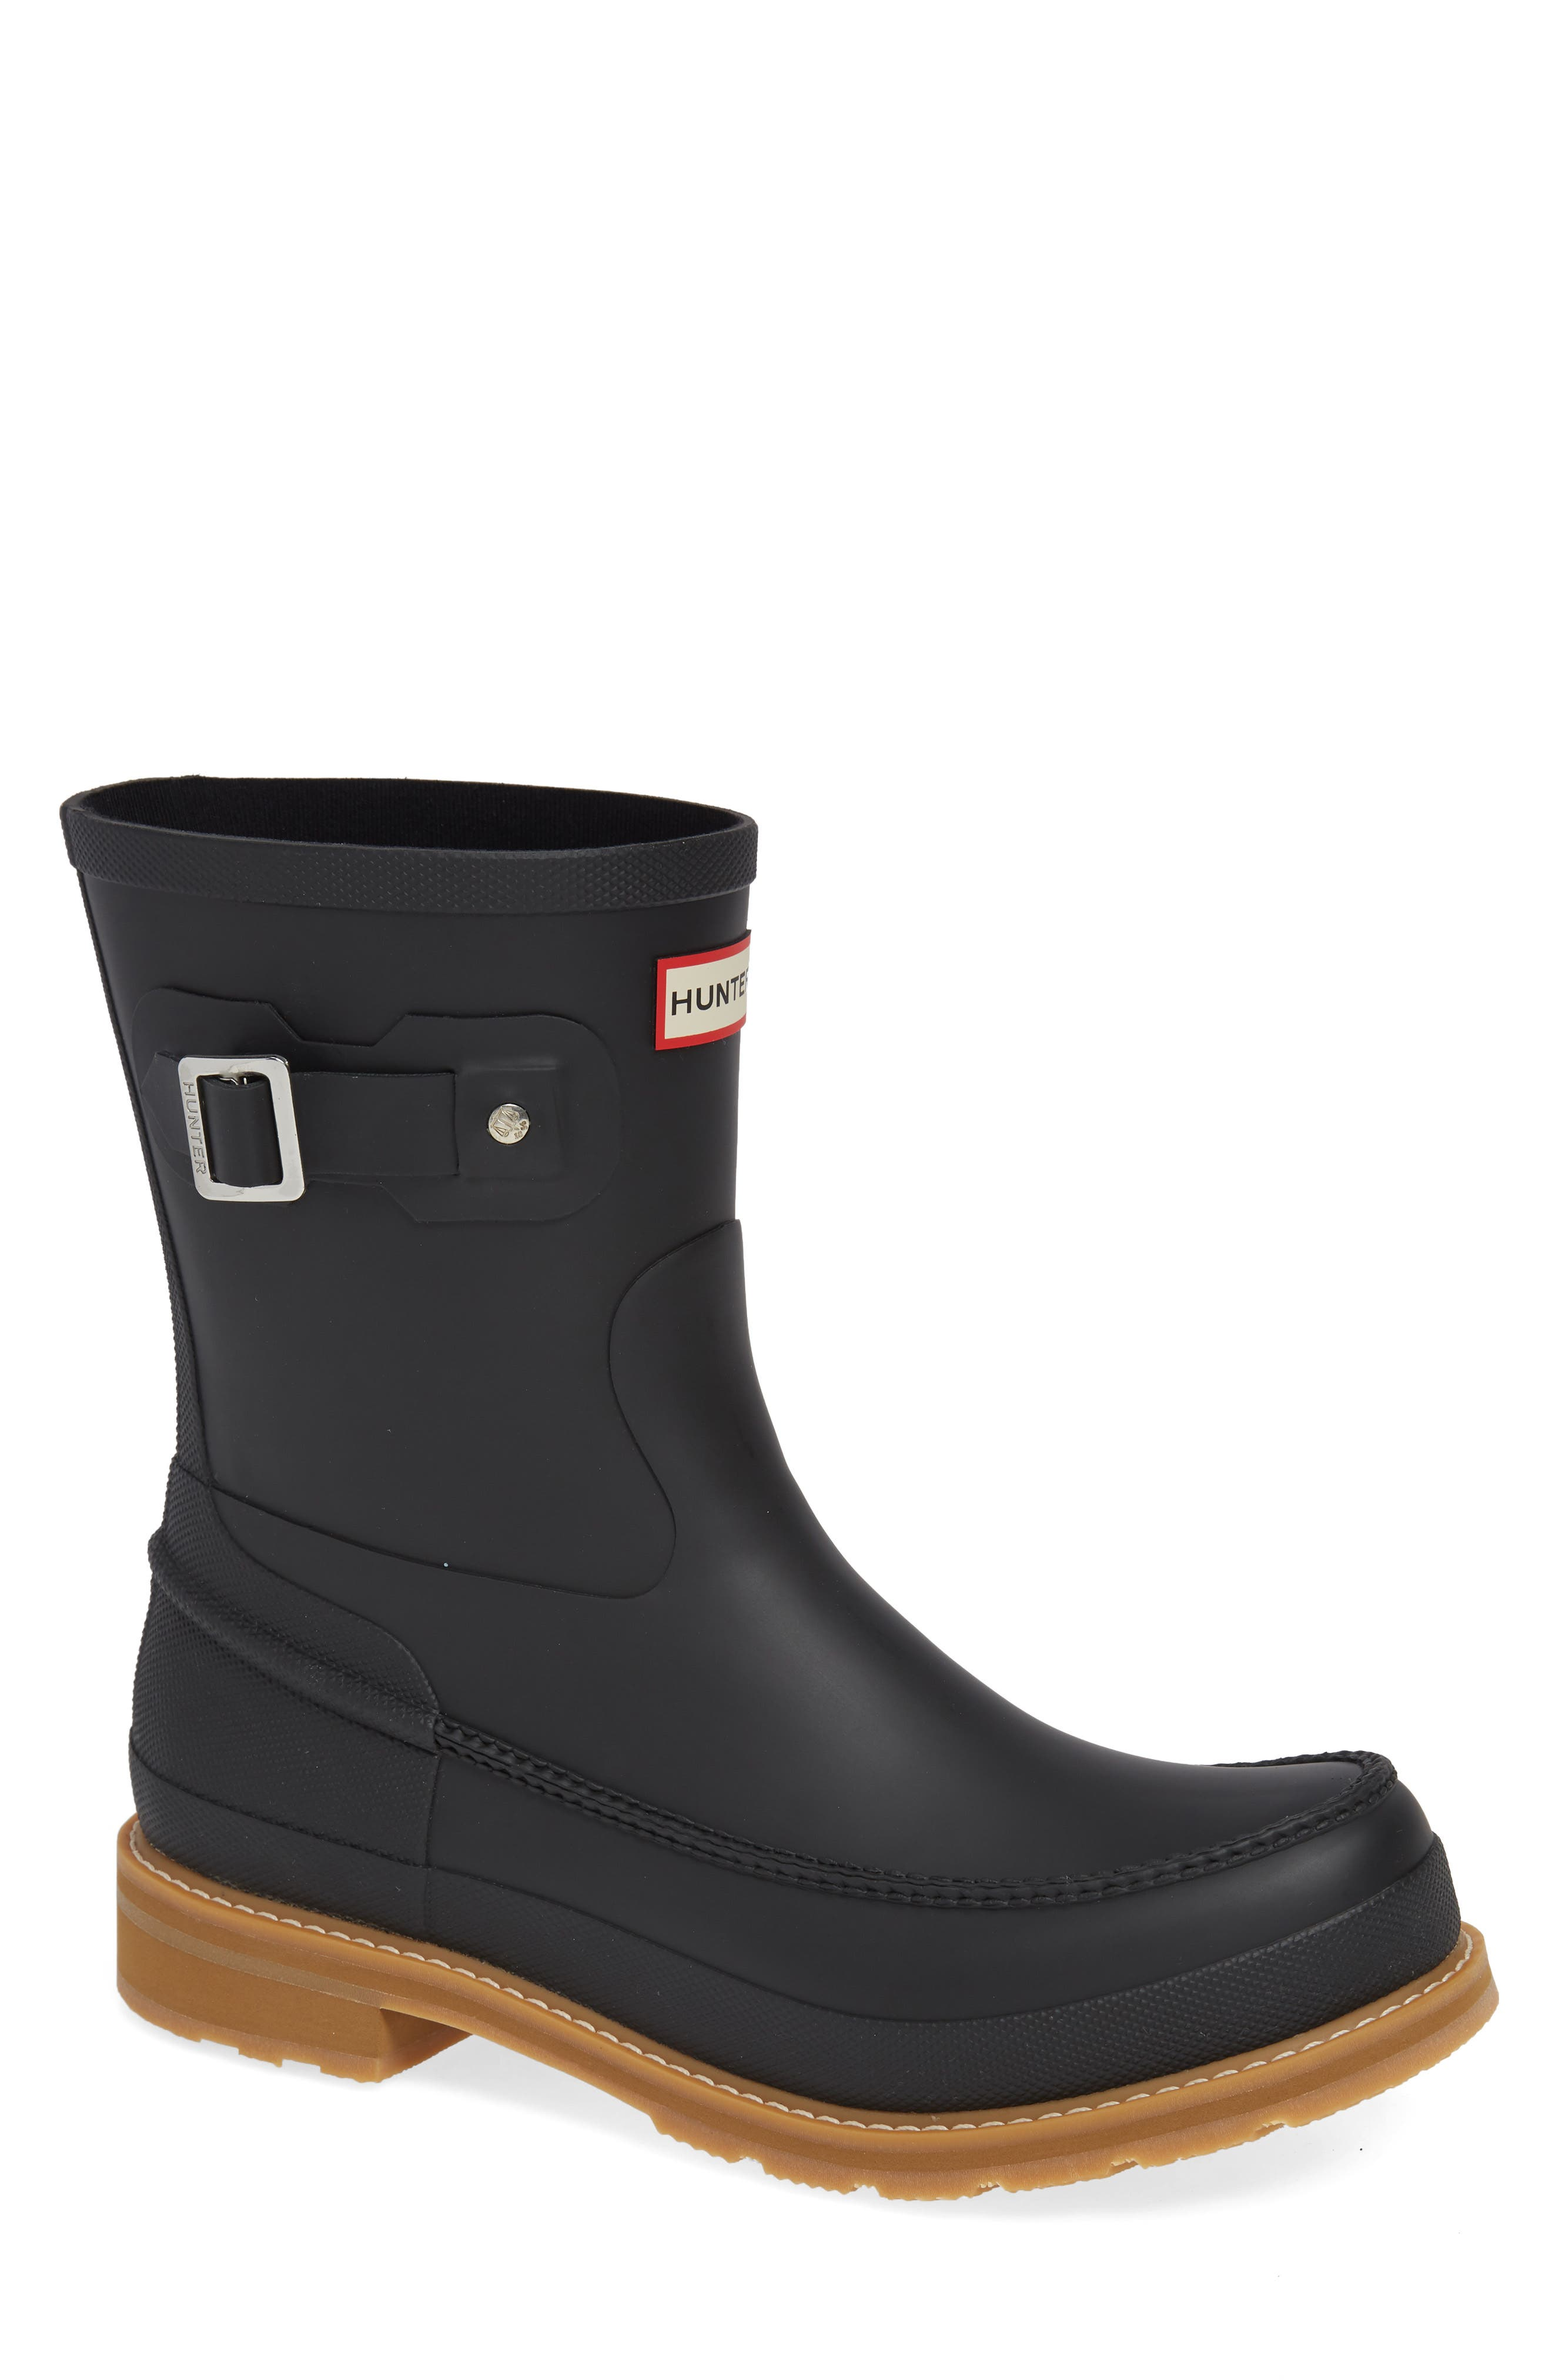 HUNTER Waterproof Lightweight Short Boot, Main, color, BLACK